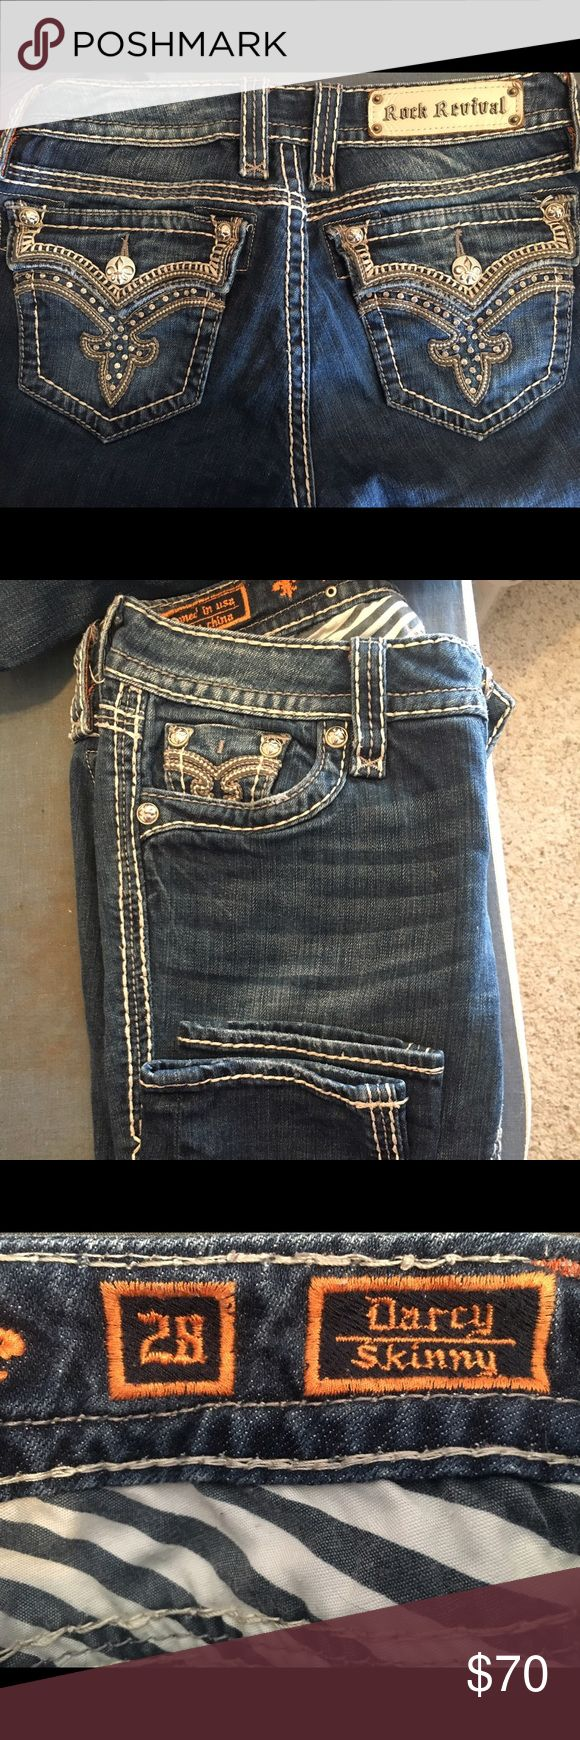 Rock Revival jeans Rock Revival jeans skinny jeans size 28 dark wash Rock Revival Jeans Skinny